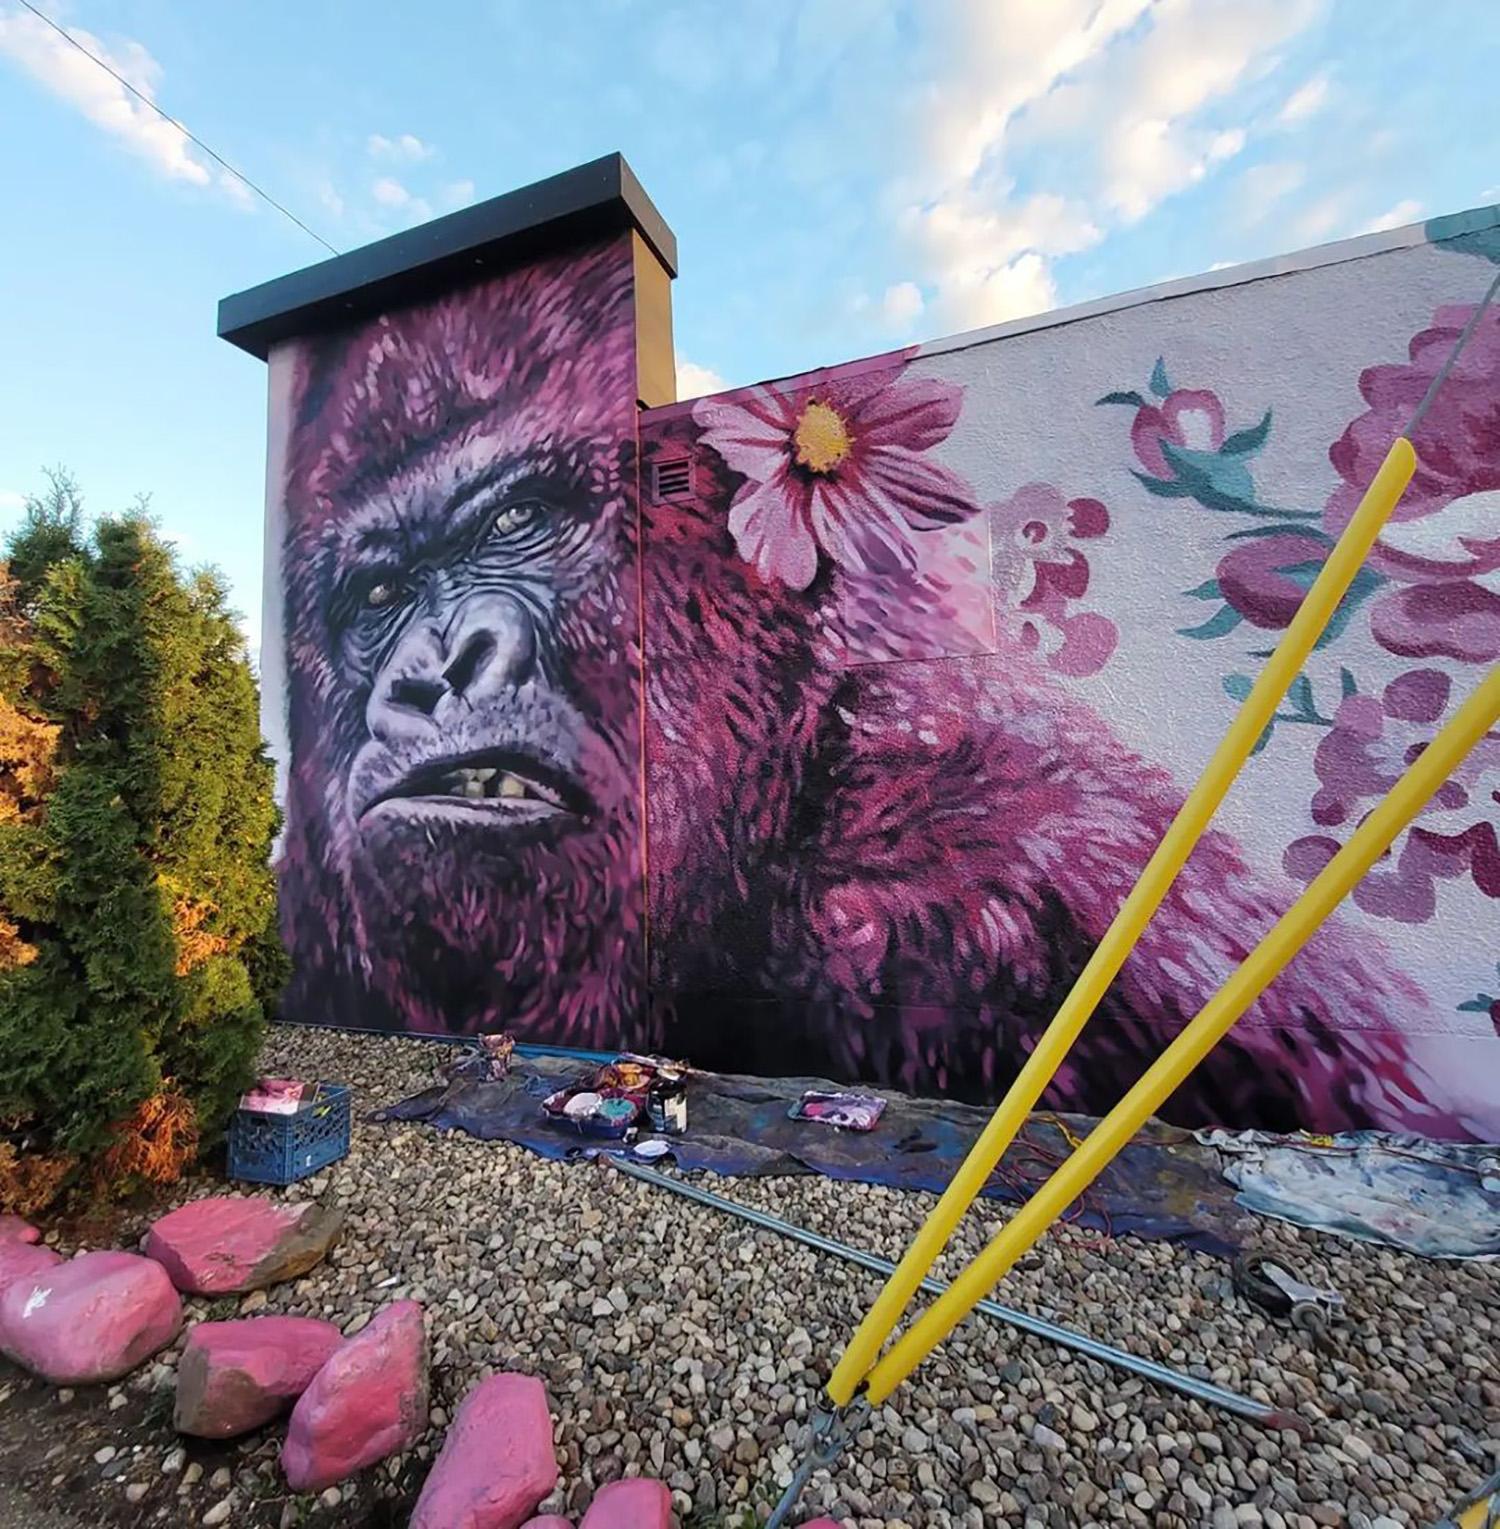 Instagrammable Walls of Edmonton - Explore Edmonton - Murals - Walls - South Edmonton - Parkallen - Pink Gorilla - Lacey jane and Layla Folkmann